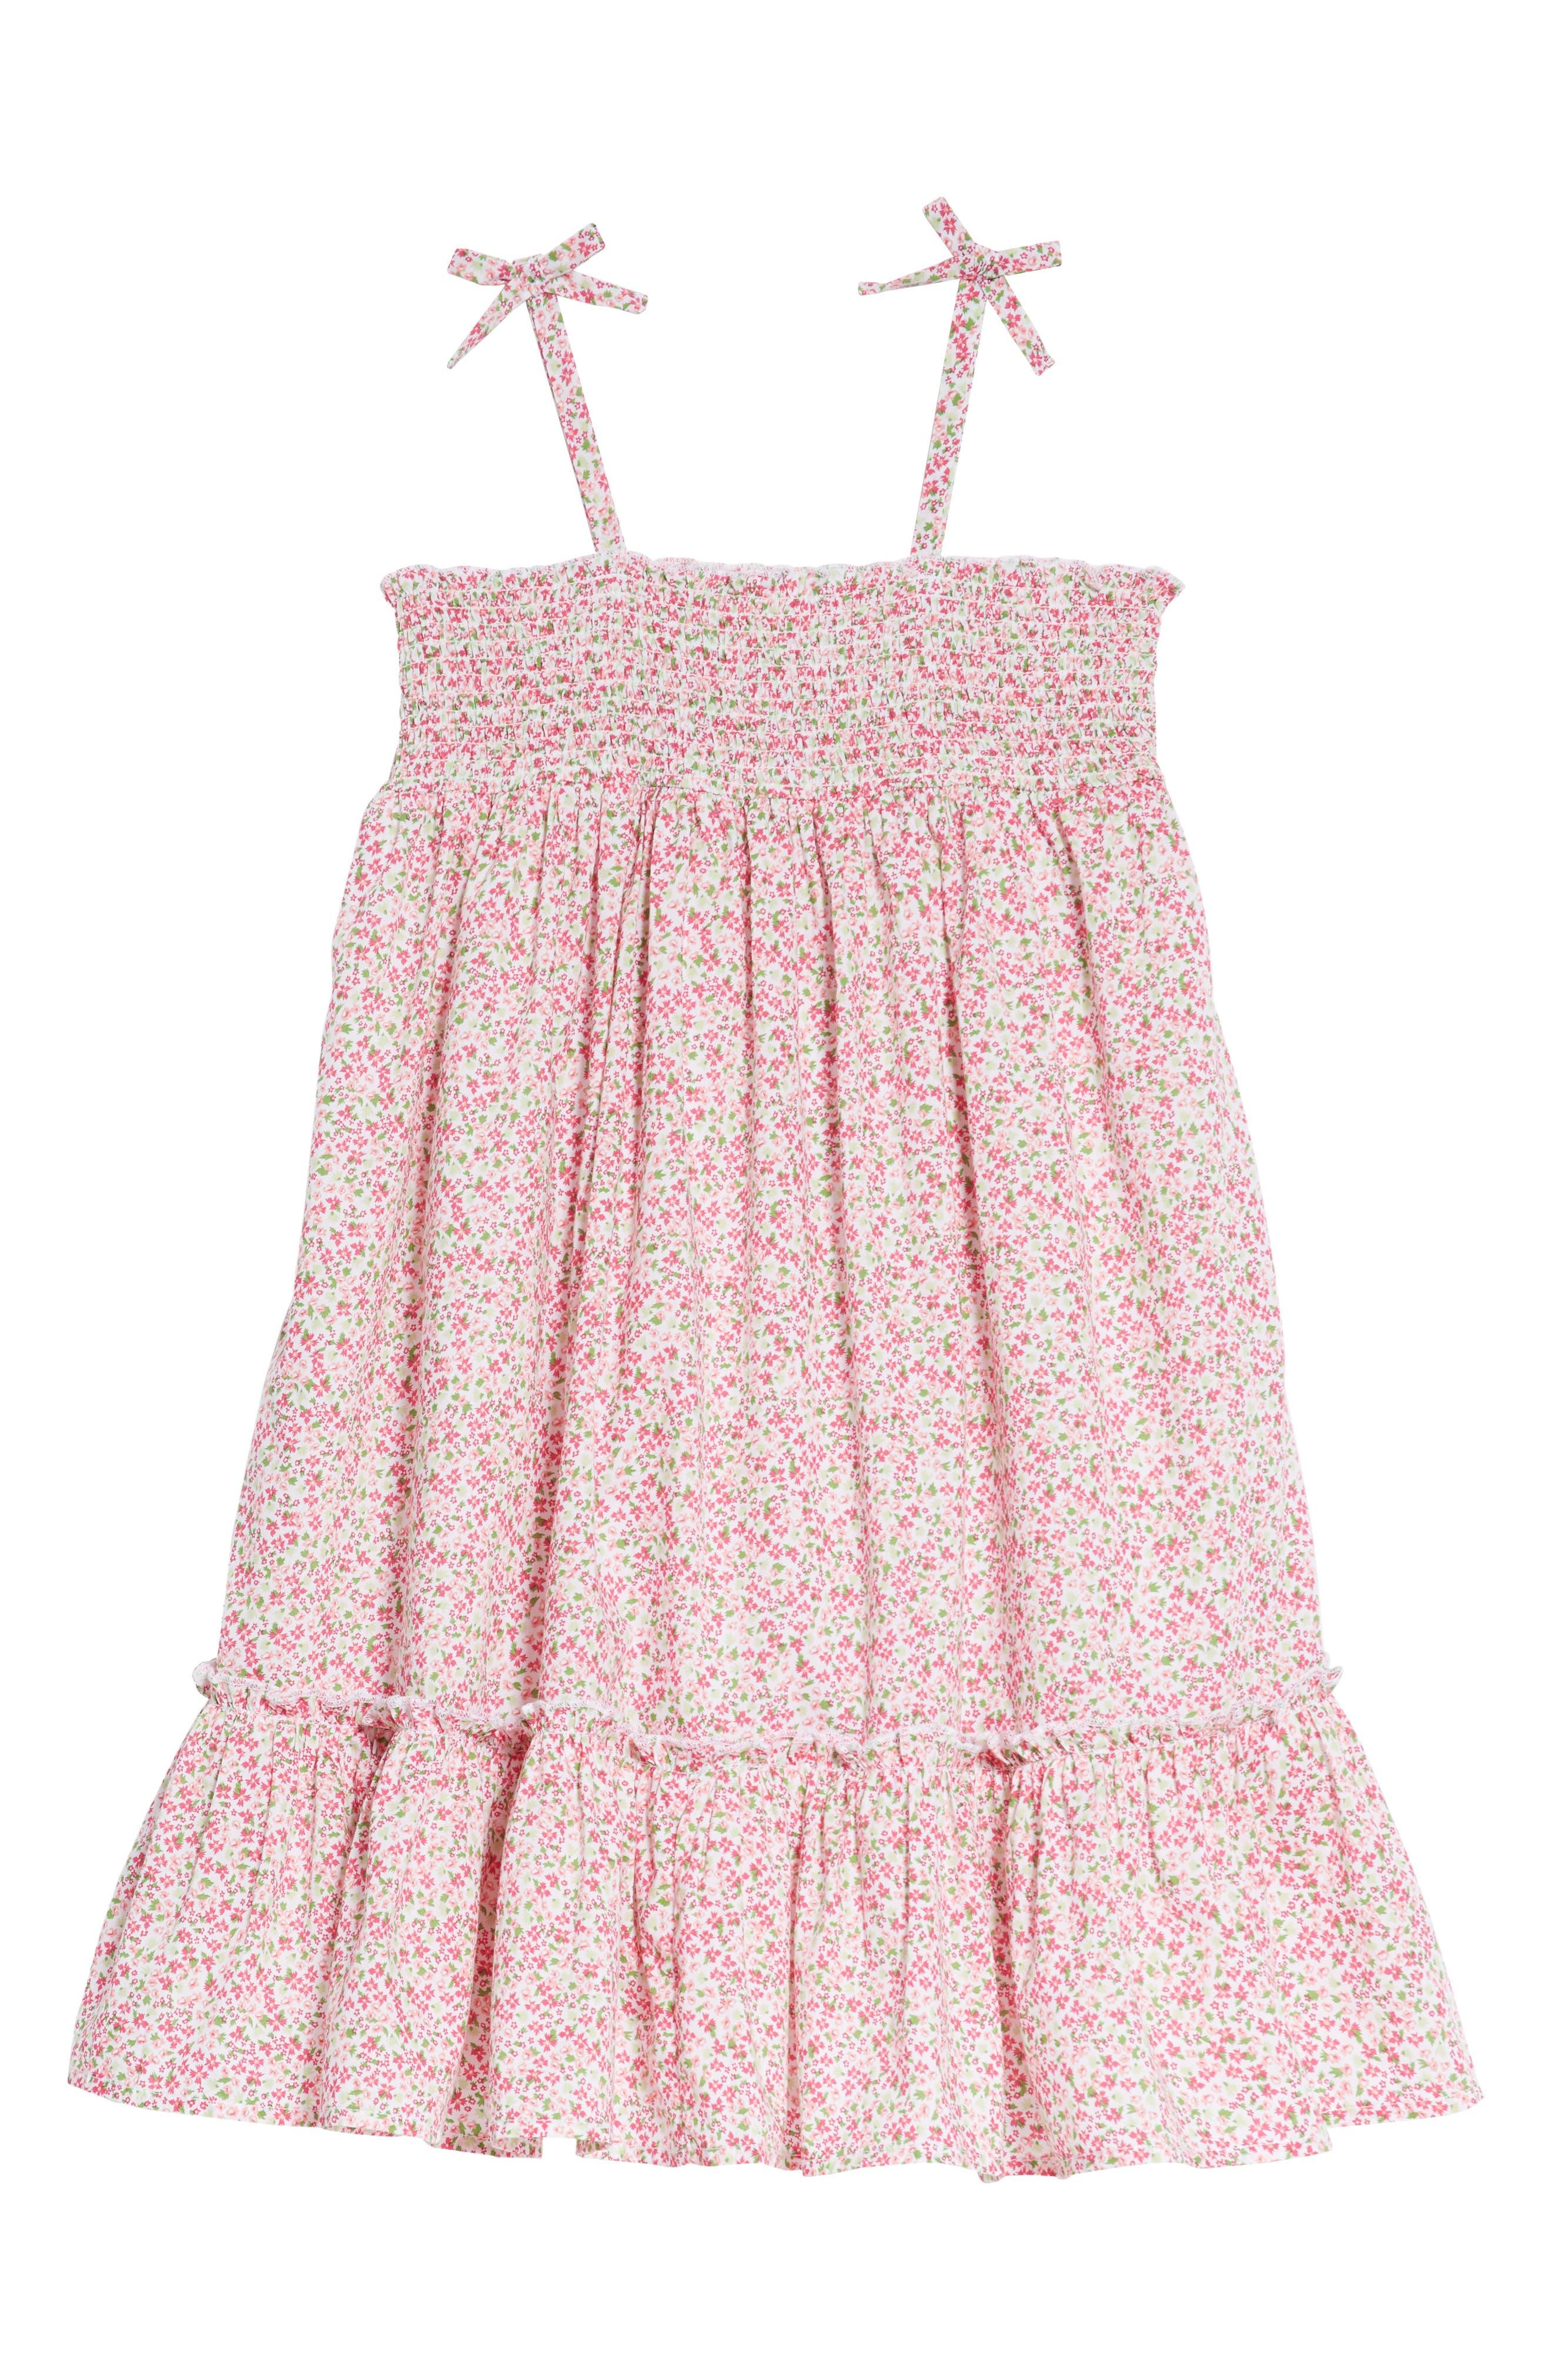 Smocked Ditzy Dress,                             Main thumbnail 1, color,                             100